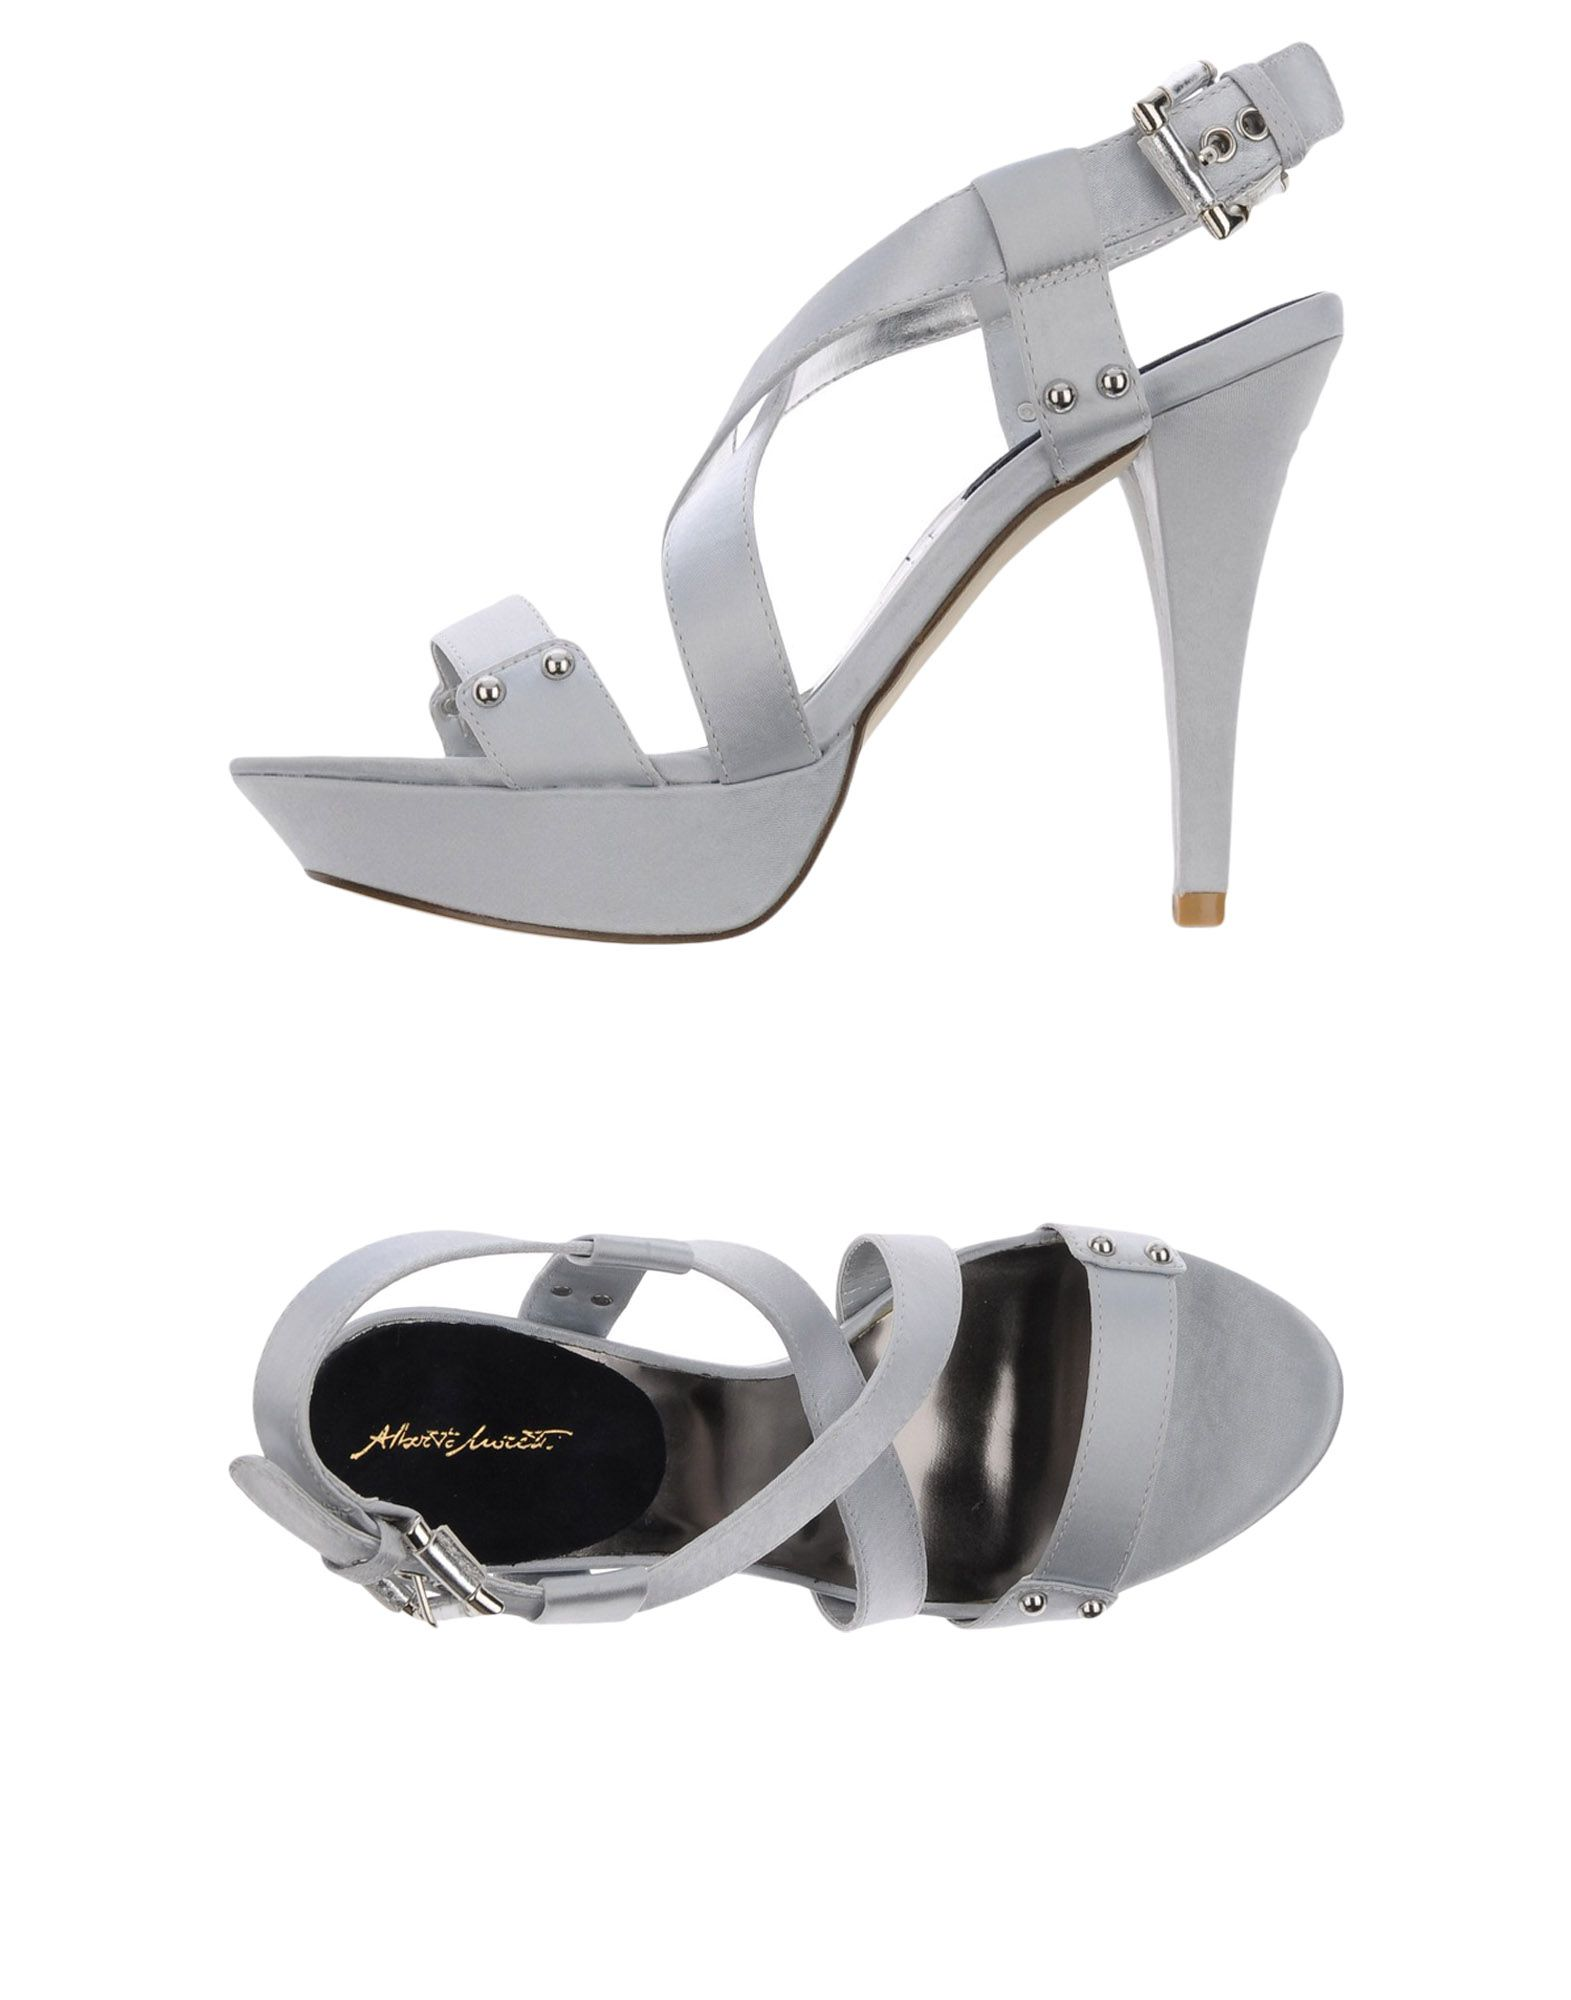 Alberto Moretti Gute Sandalen Damen  11238147XV Gute Moretti Qualität beliebte Schuhe 8e9f46